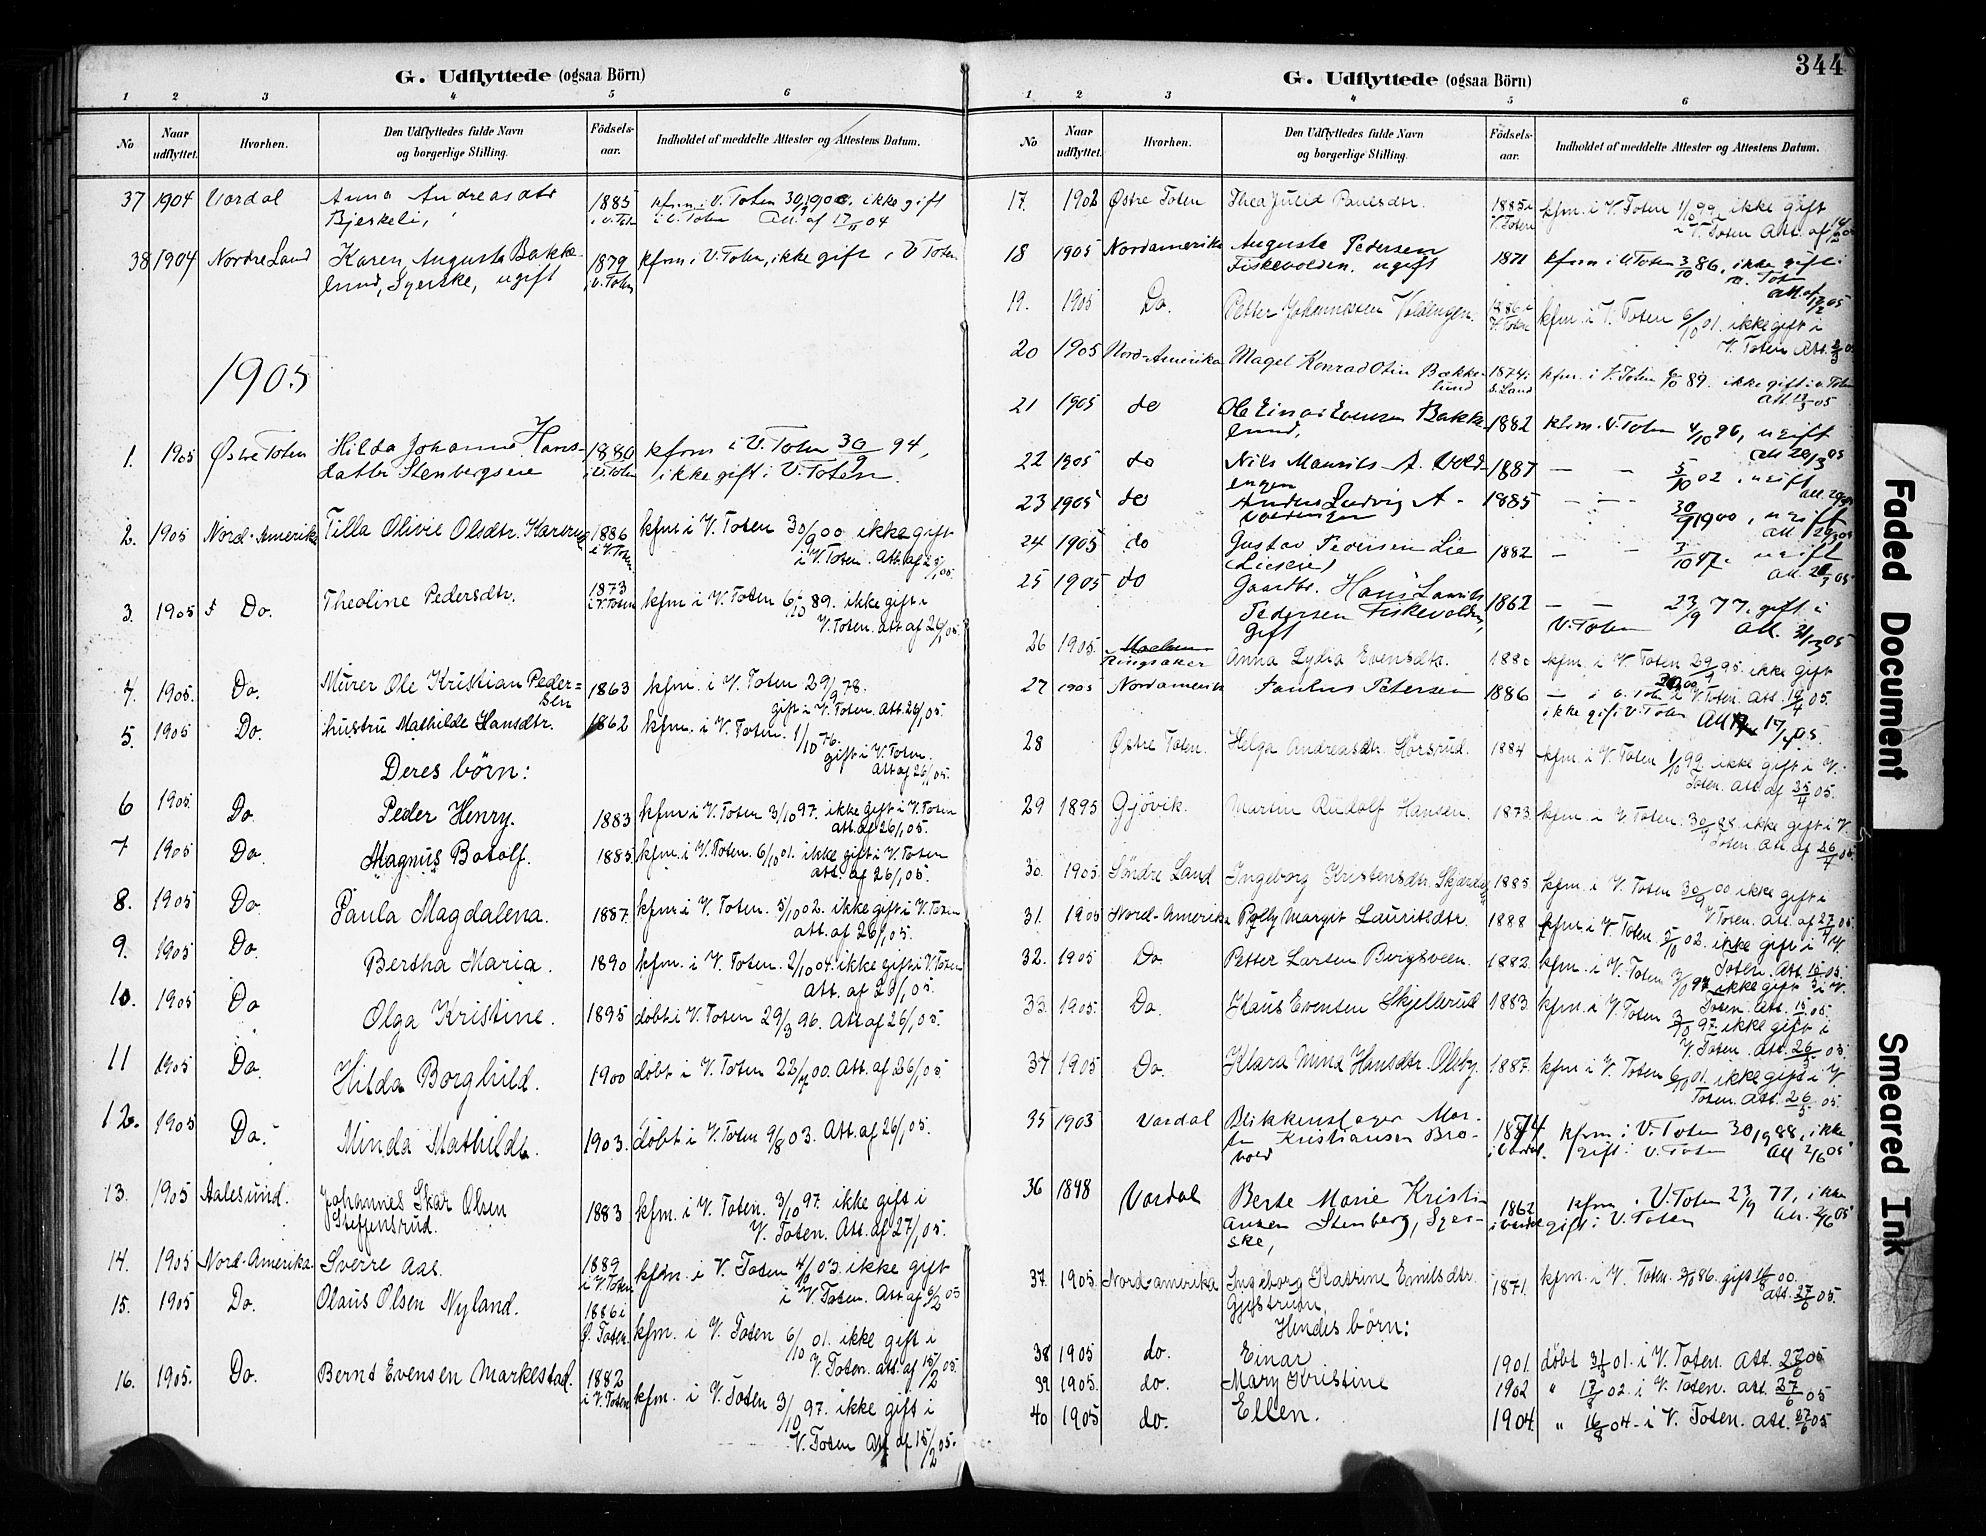 SAH, Vestre Toten prestekontor, H/Ha/Haa/L0011: Ministerialbok nr. 11, 1895-1906, s. 344